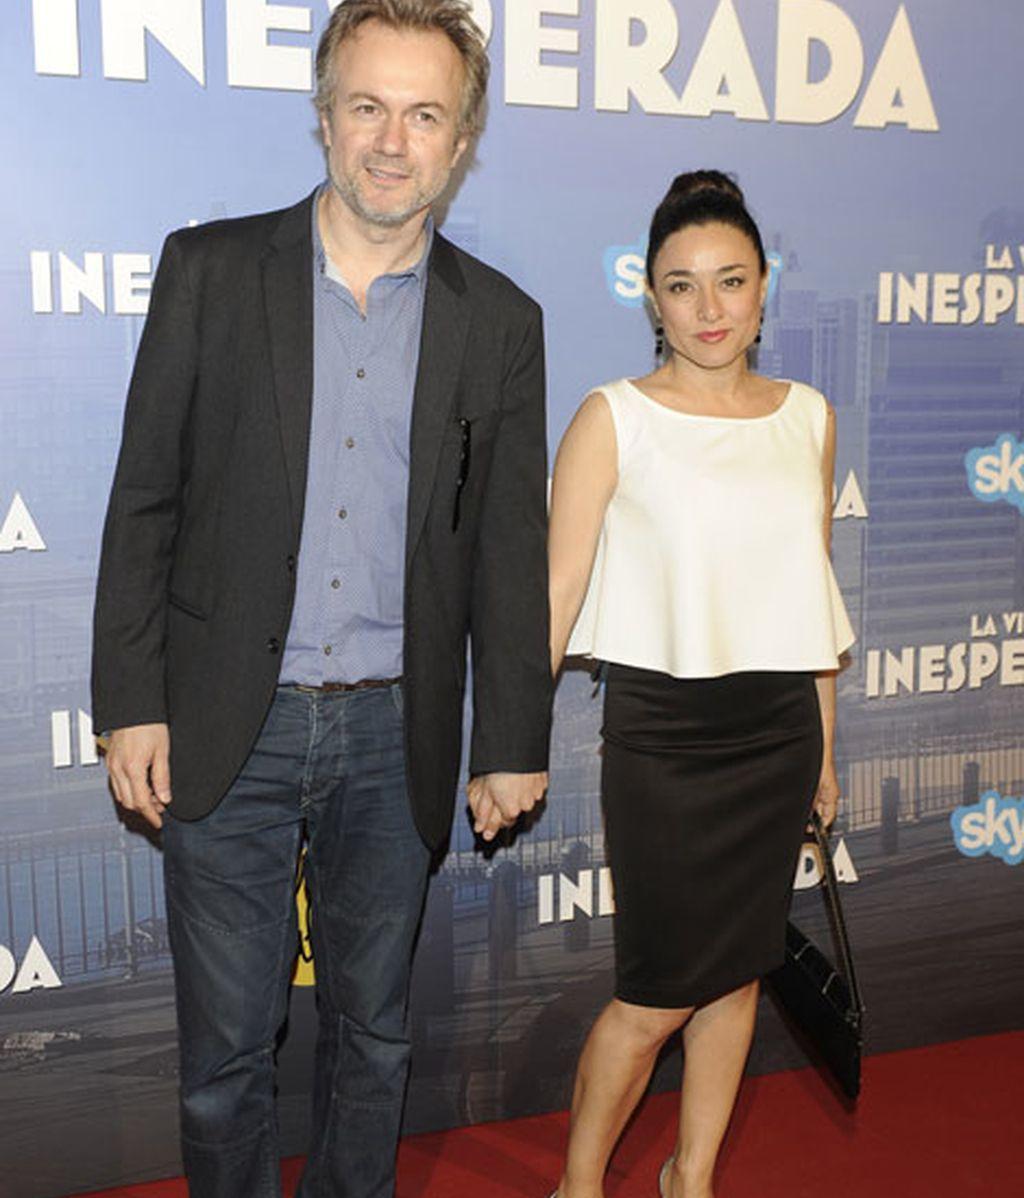 Tristán Ulloa y su pareja, Carolina Roman